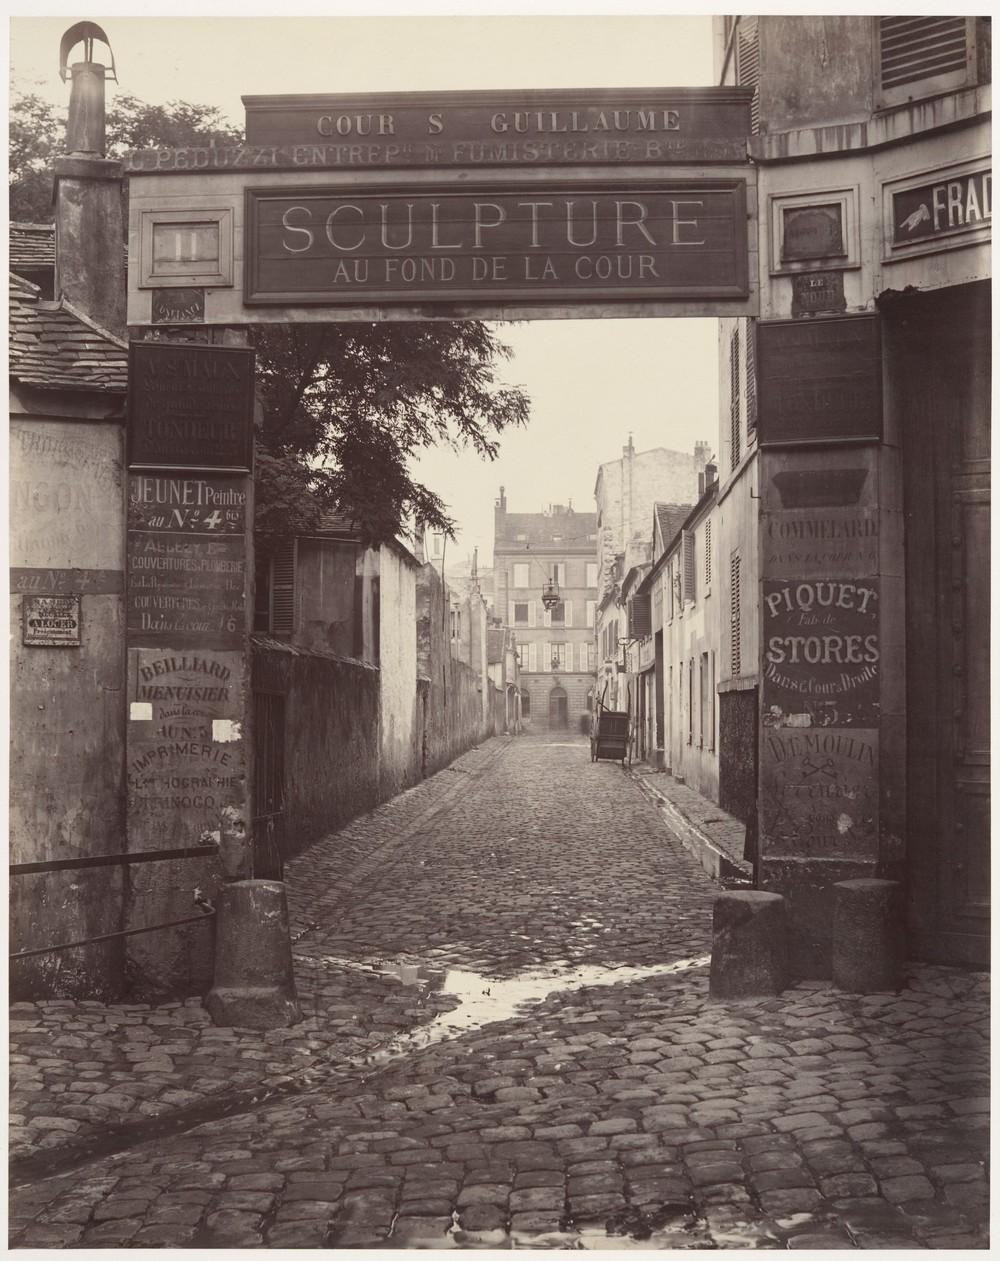 Sparkling sewage inCour Saint-Guillaume, 1865.